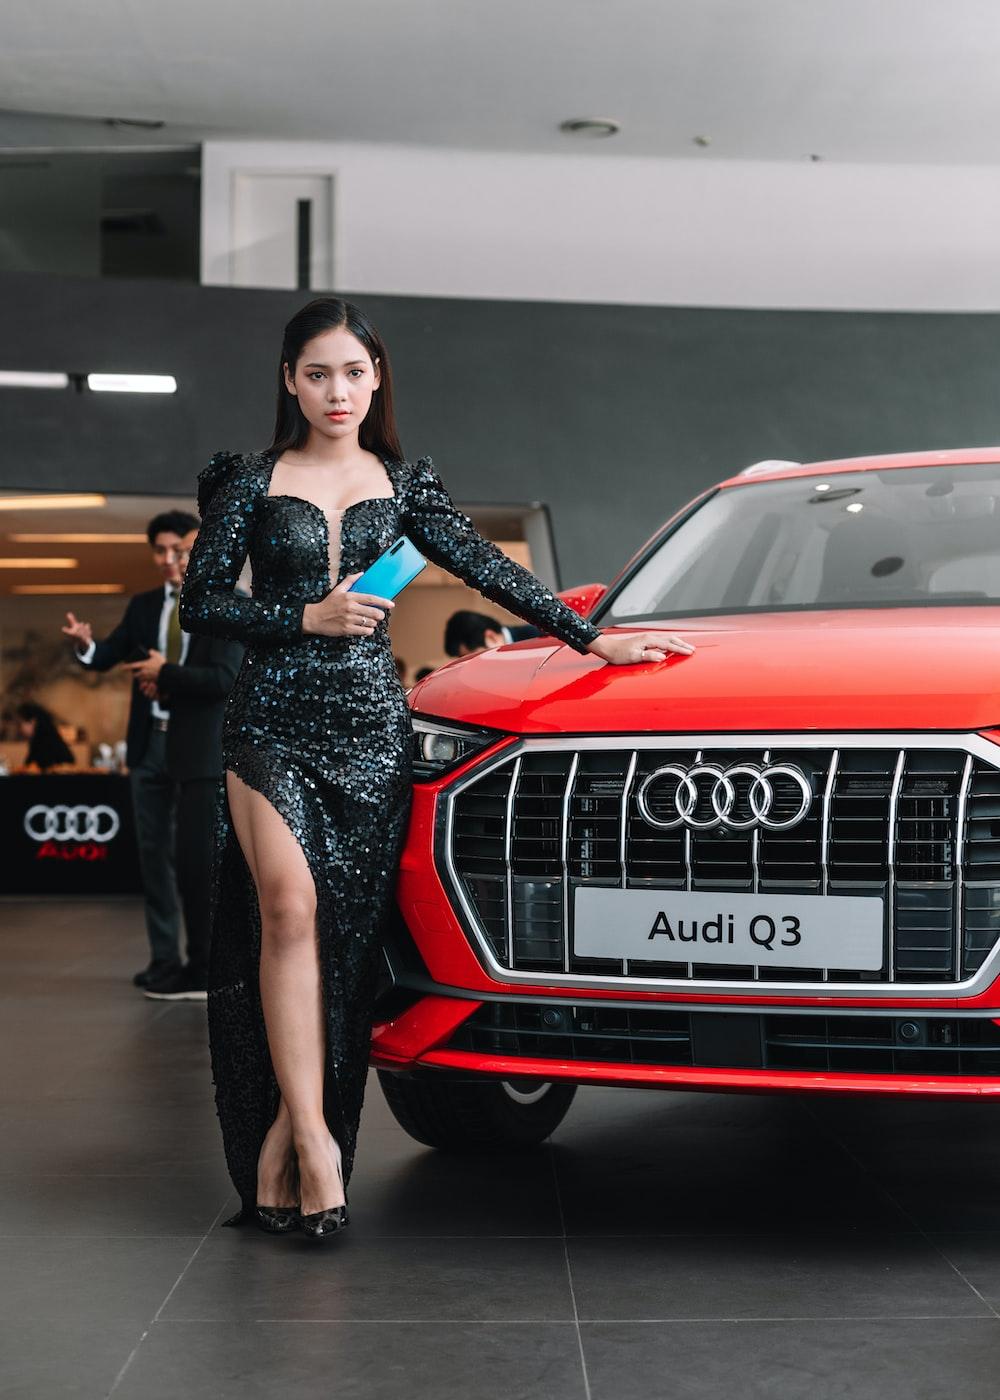 woman in black dress standing beside red audi car